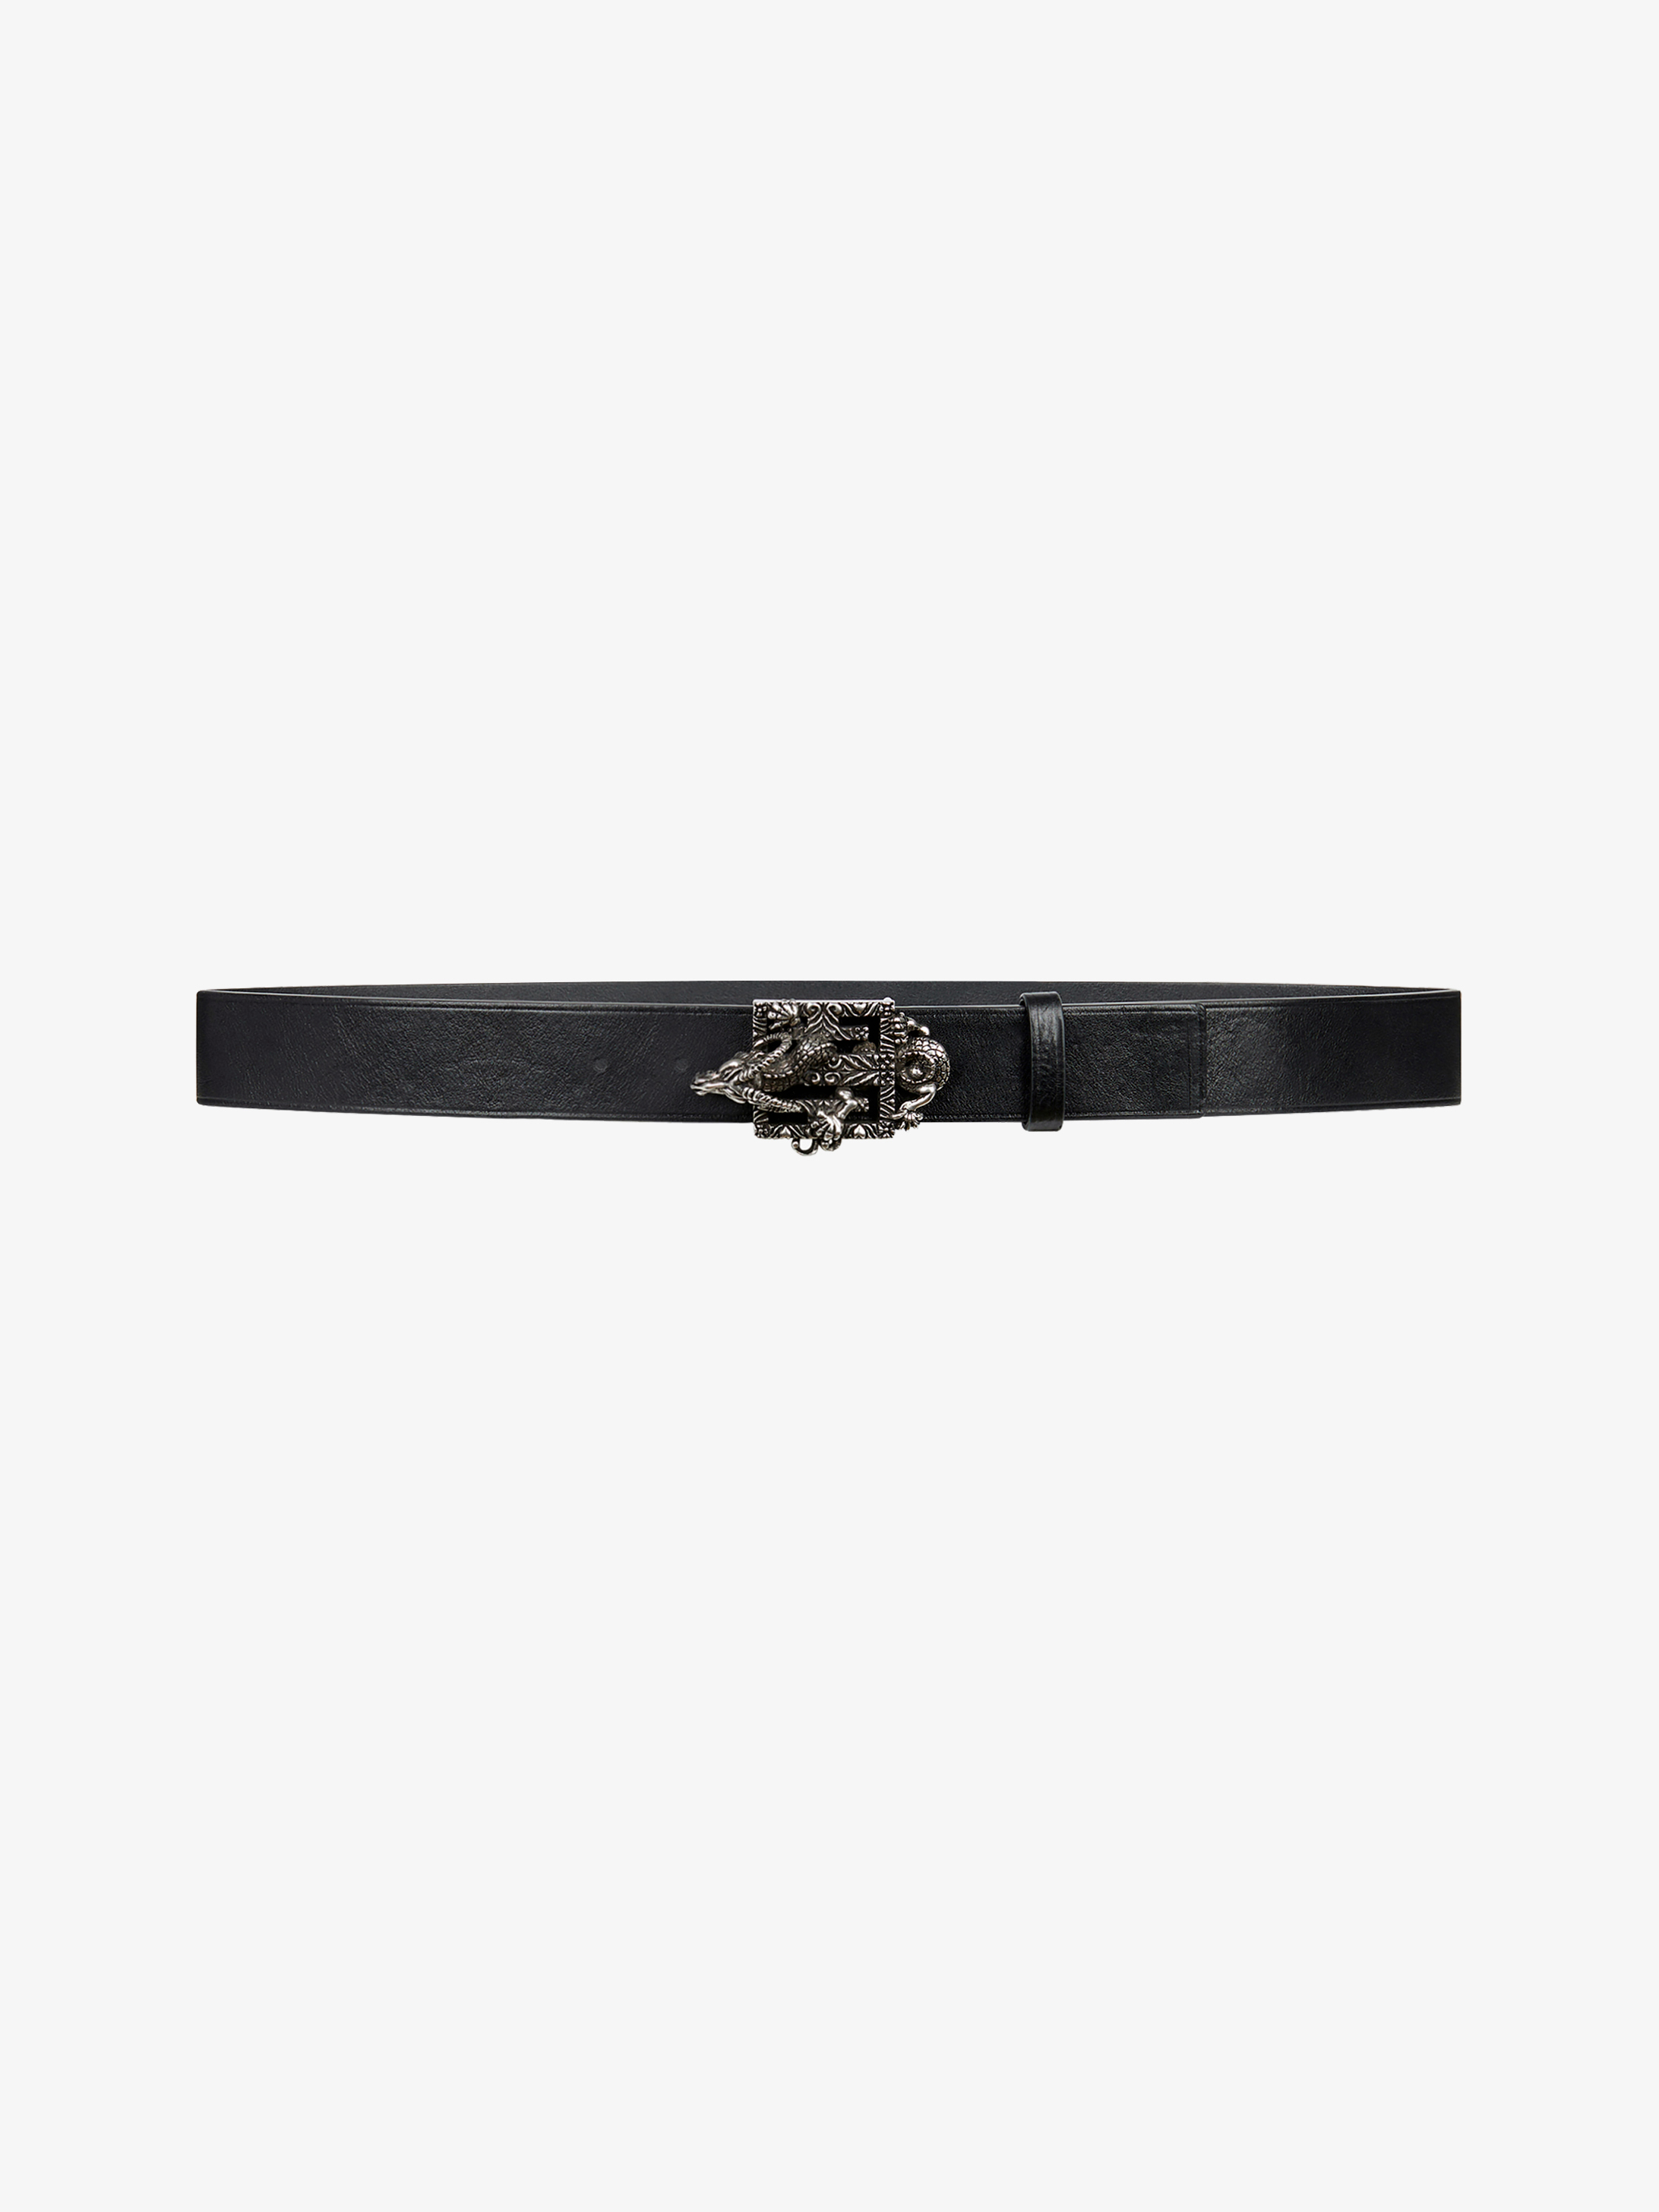 4G Capricorn buckle belt in leather